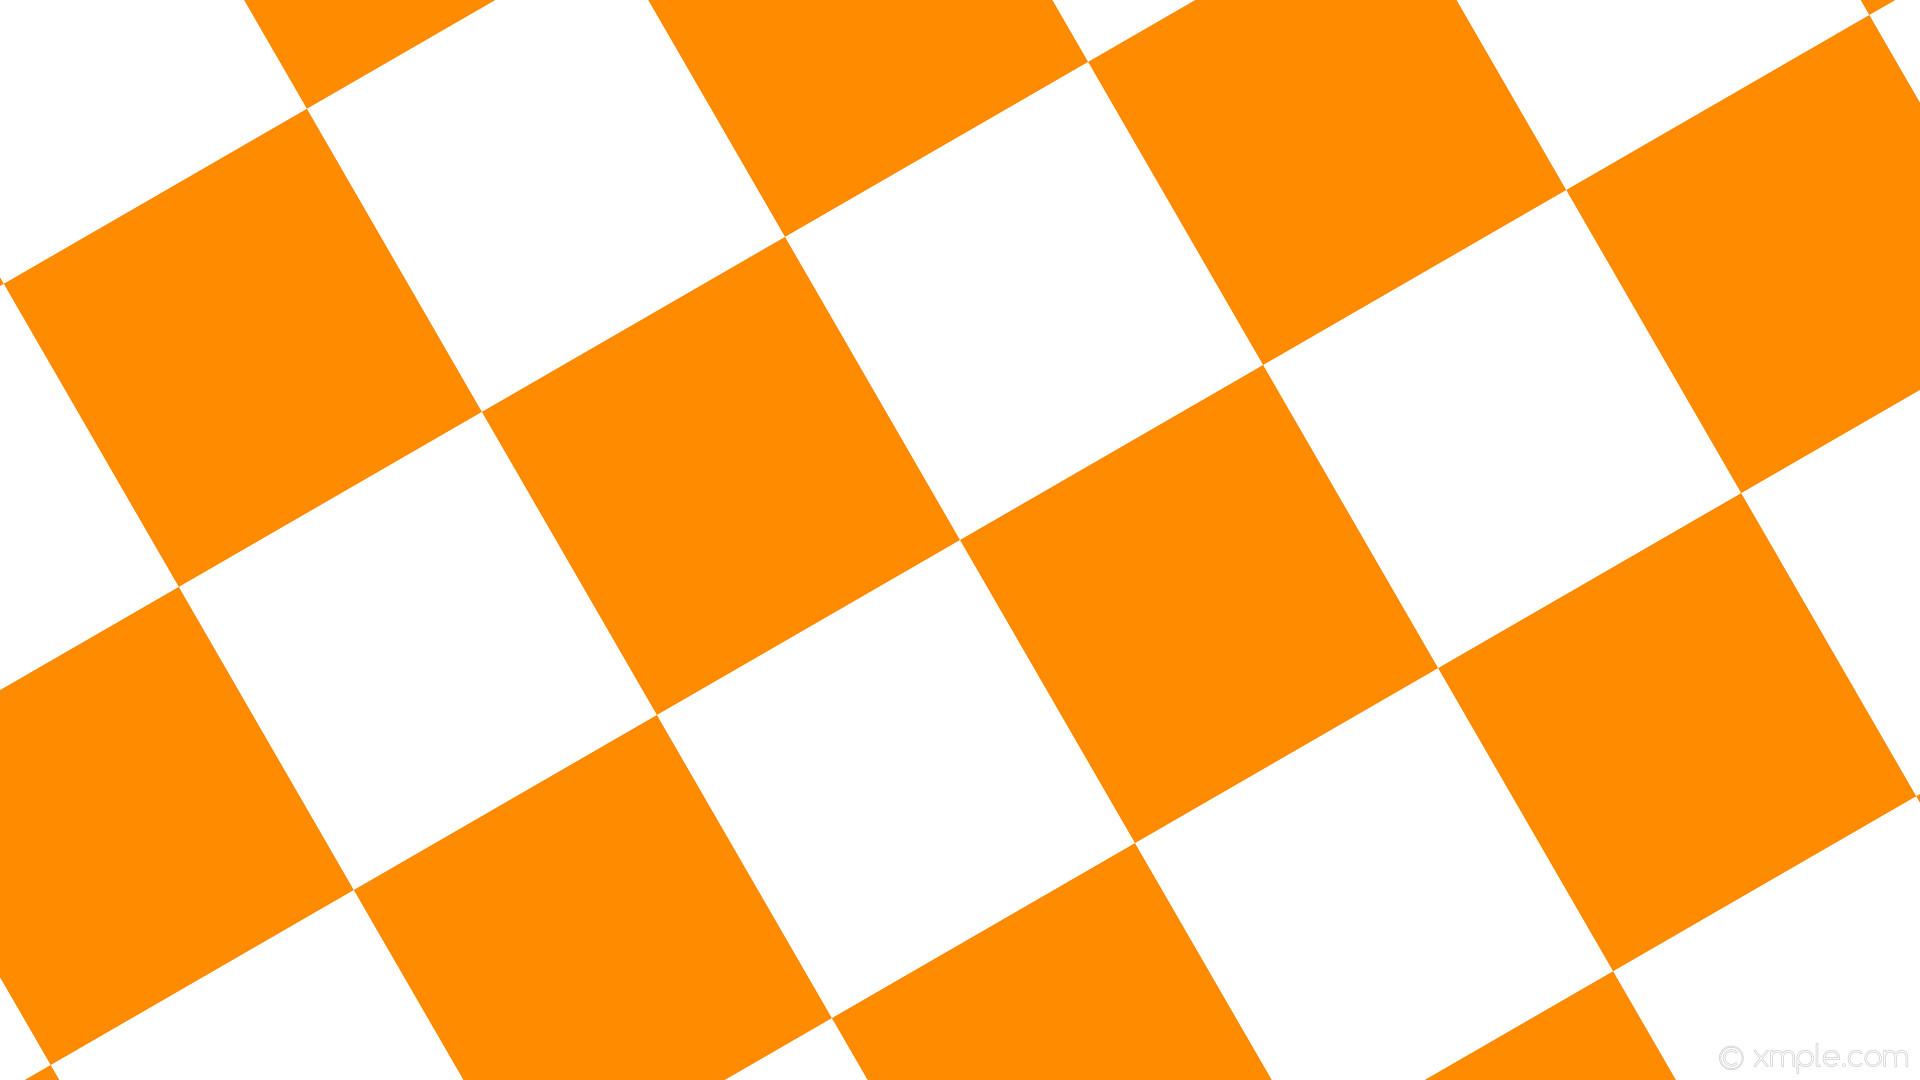 wallpaper squares checkered orange white dark orange #ff8c00 #ffffff  diagonal 30° 350px